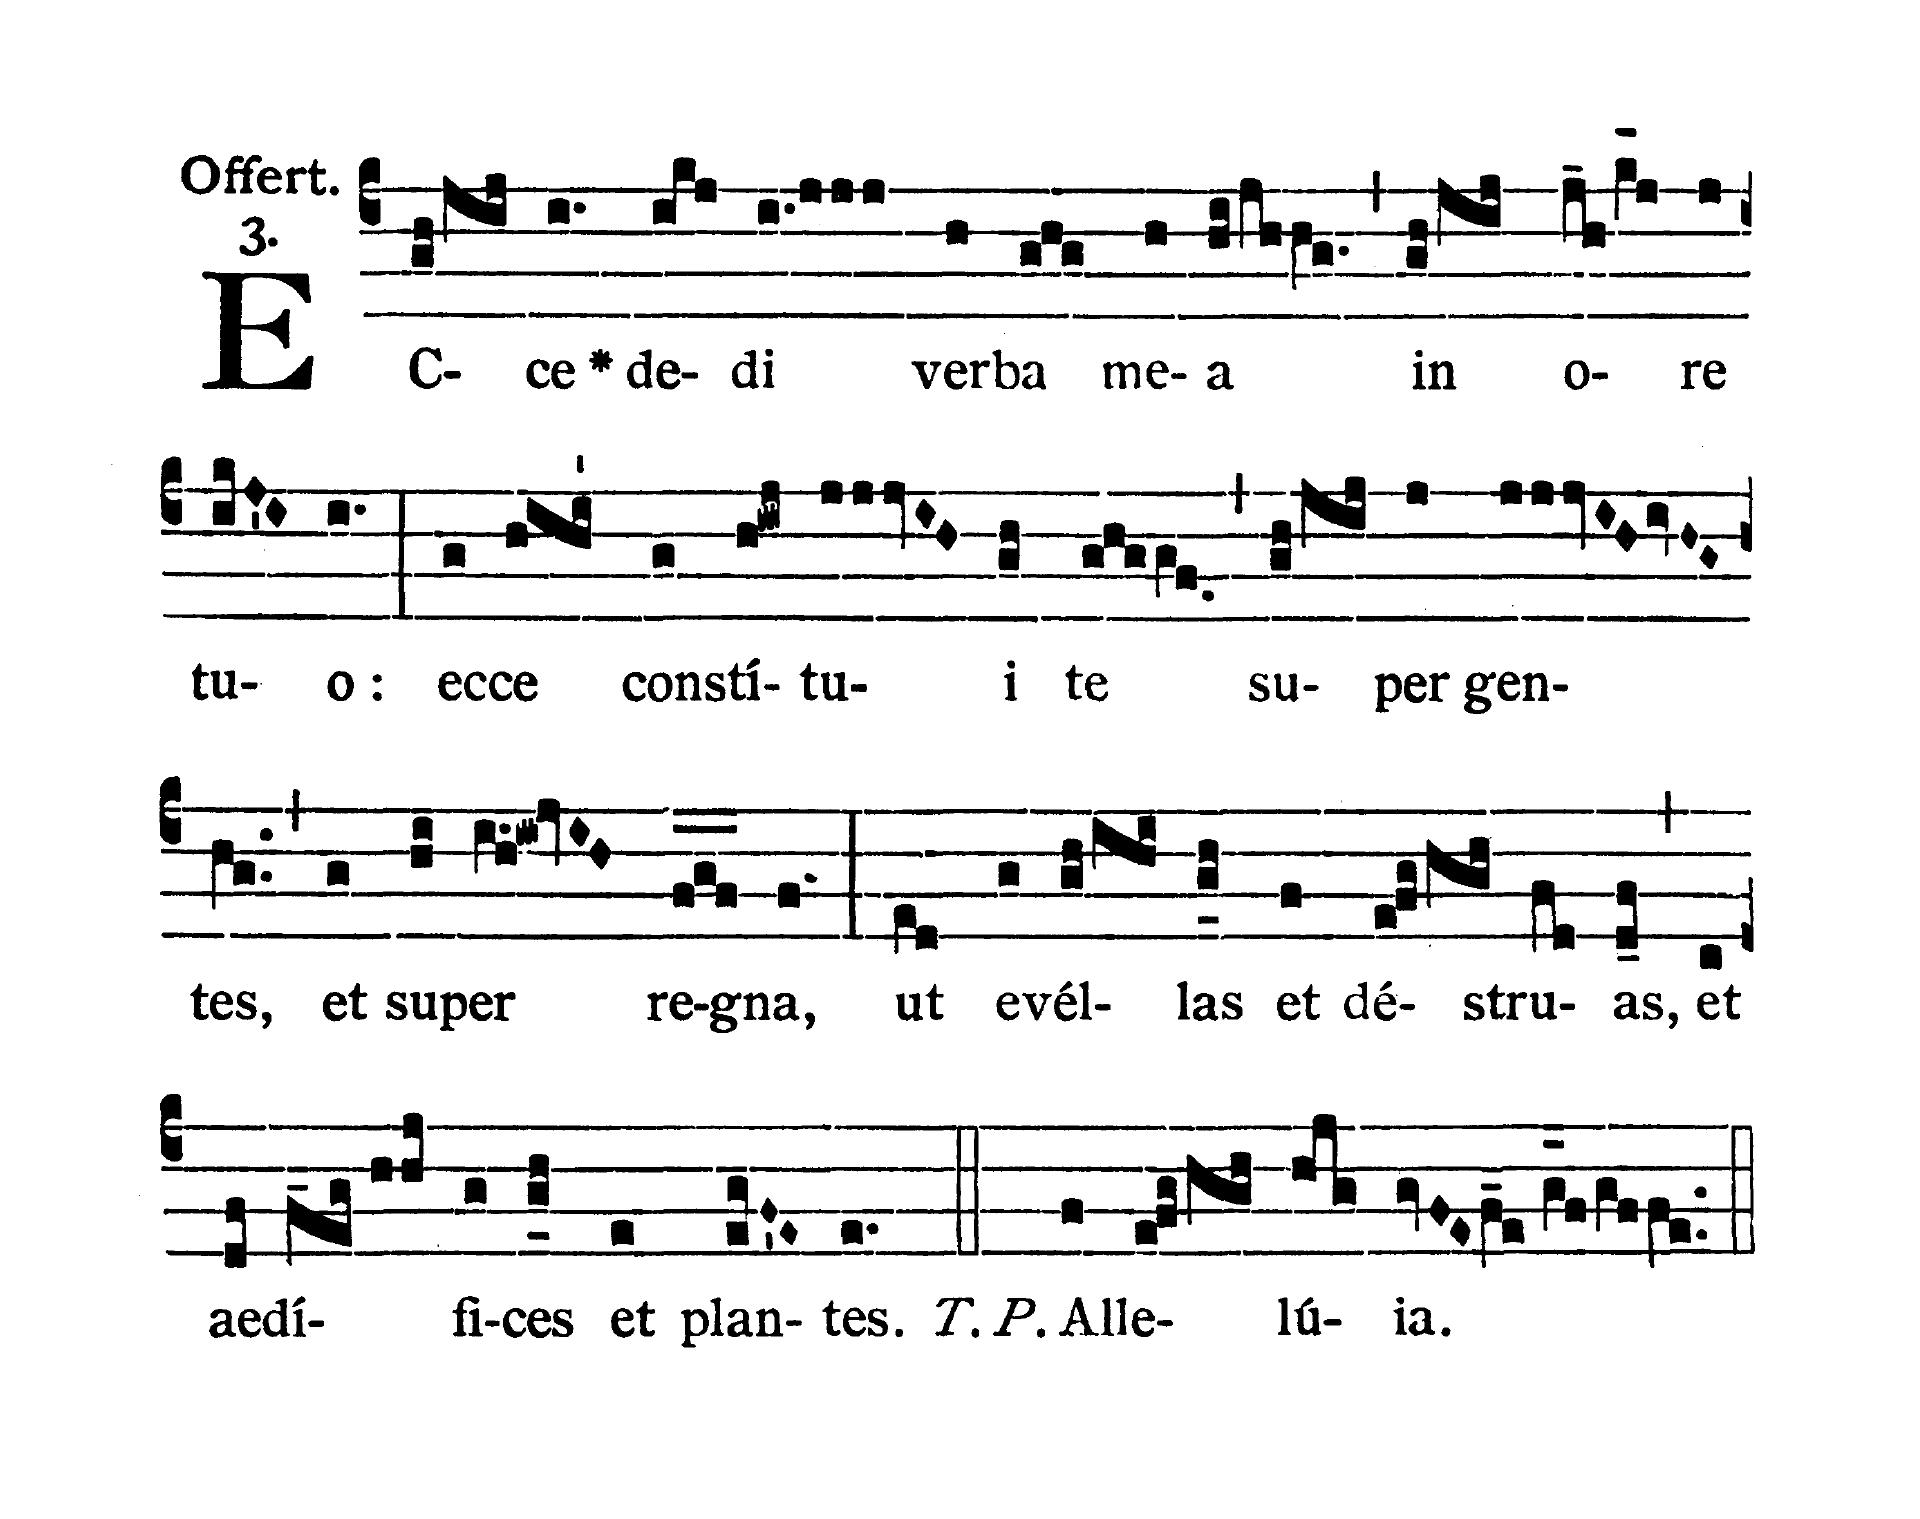 Sancti Silvestri I Papae et Confessoris (St. Sylvester I Pope, Confessor) - Offertorium (Ecce dedi)